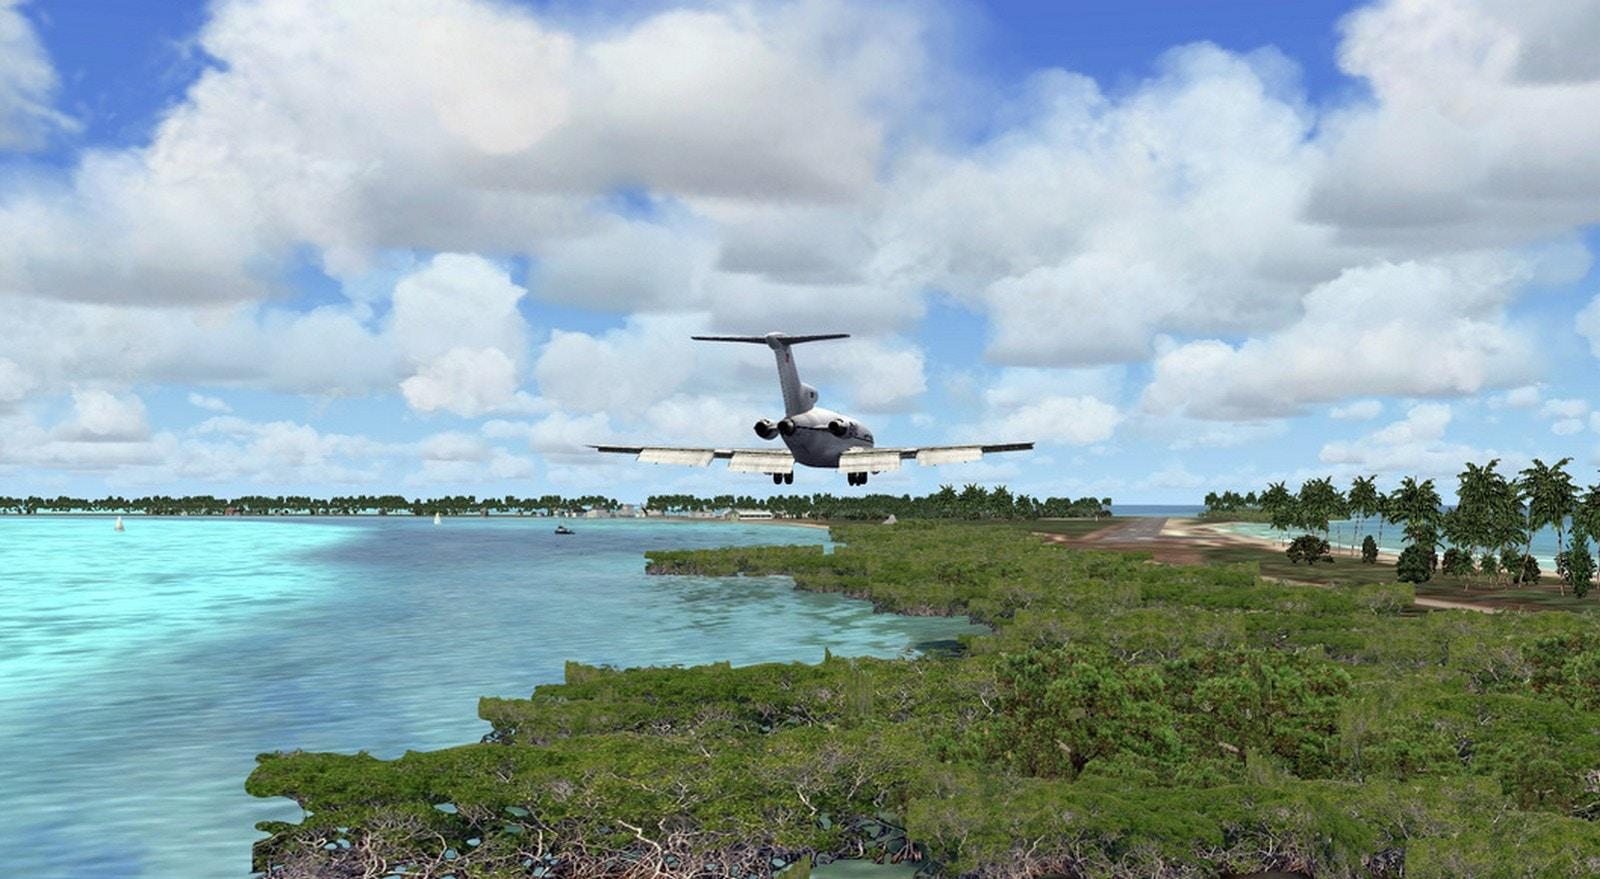 PacSim – Marshall Islands (PKRP / RNP) – DCTRY